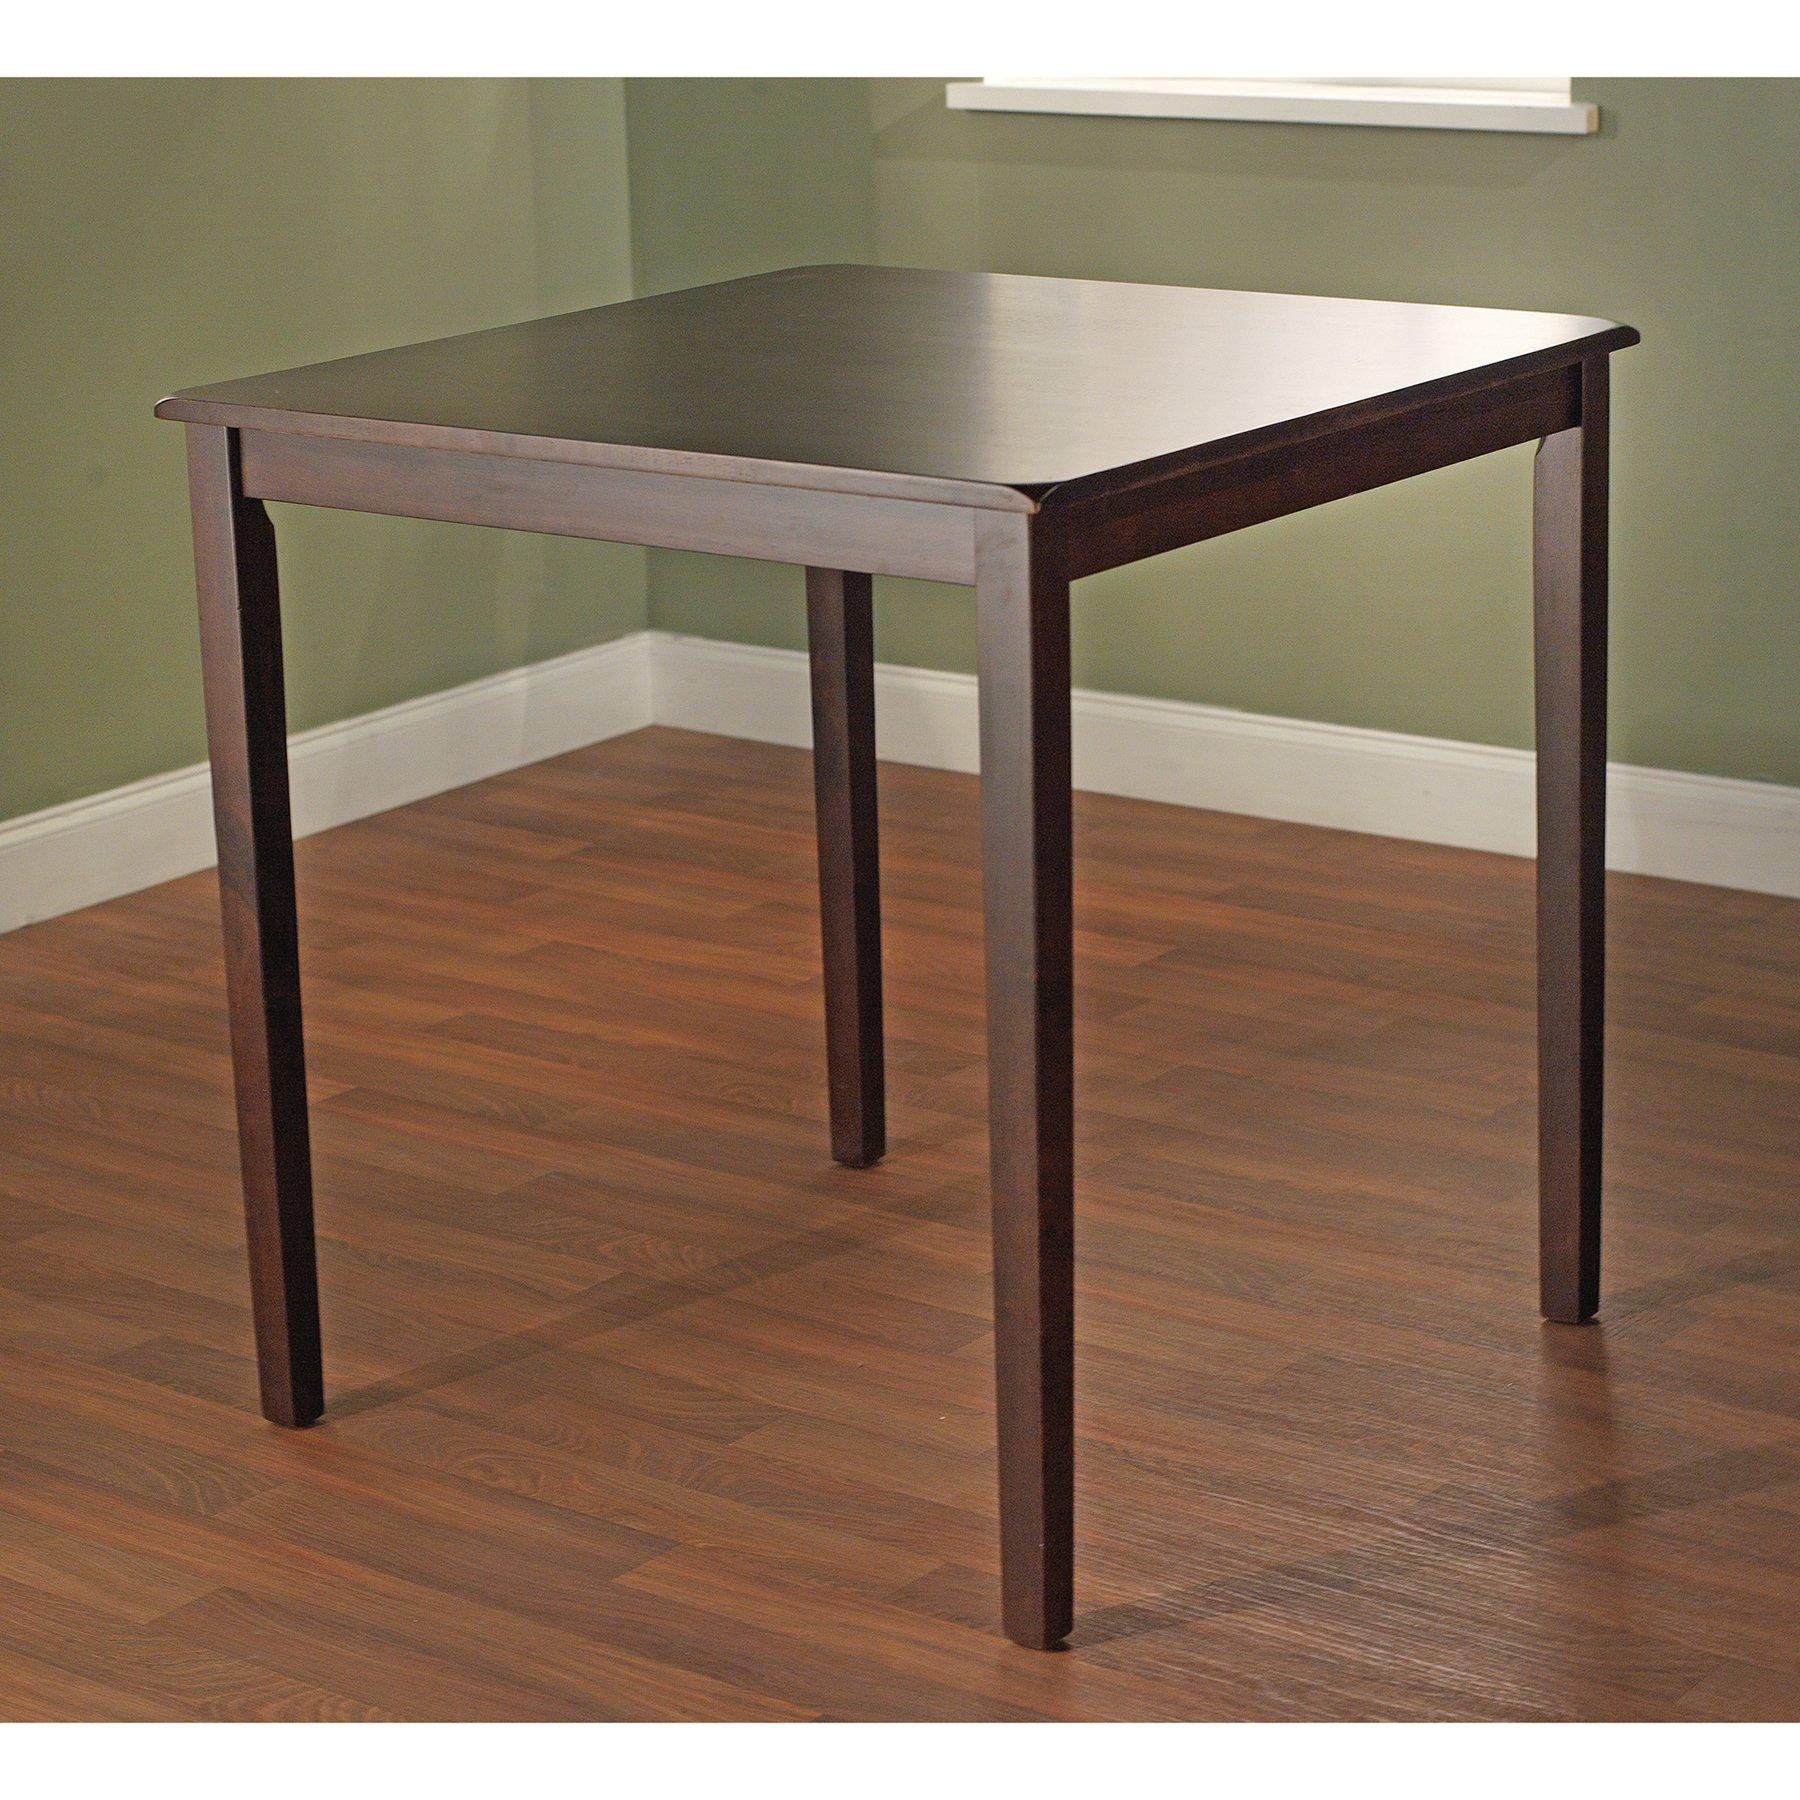 Target Marketing Systems 20351ESP Belfast Counter Height Table, Espresso by Target Marketing Systems (Image #2)